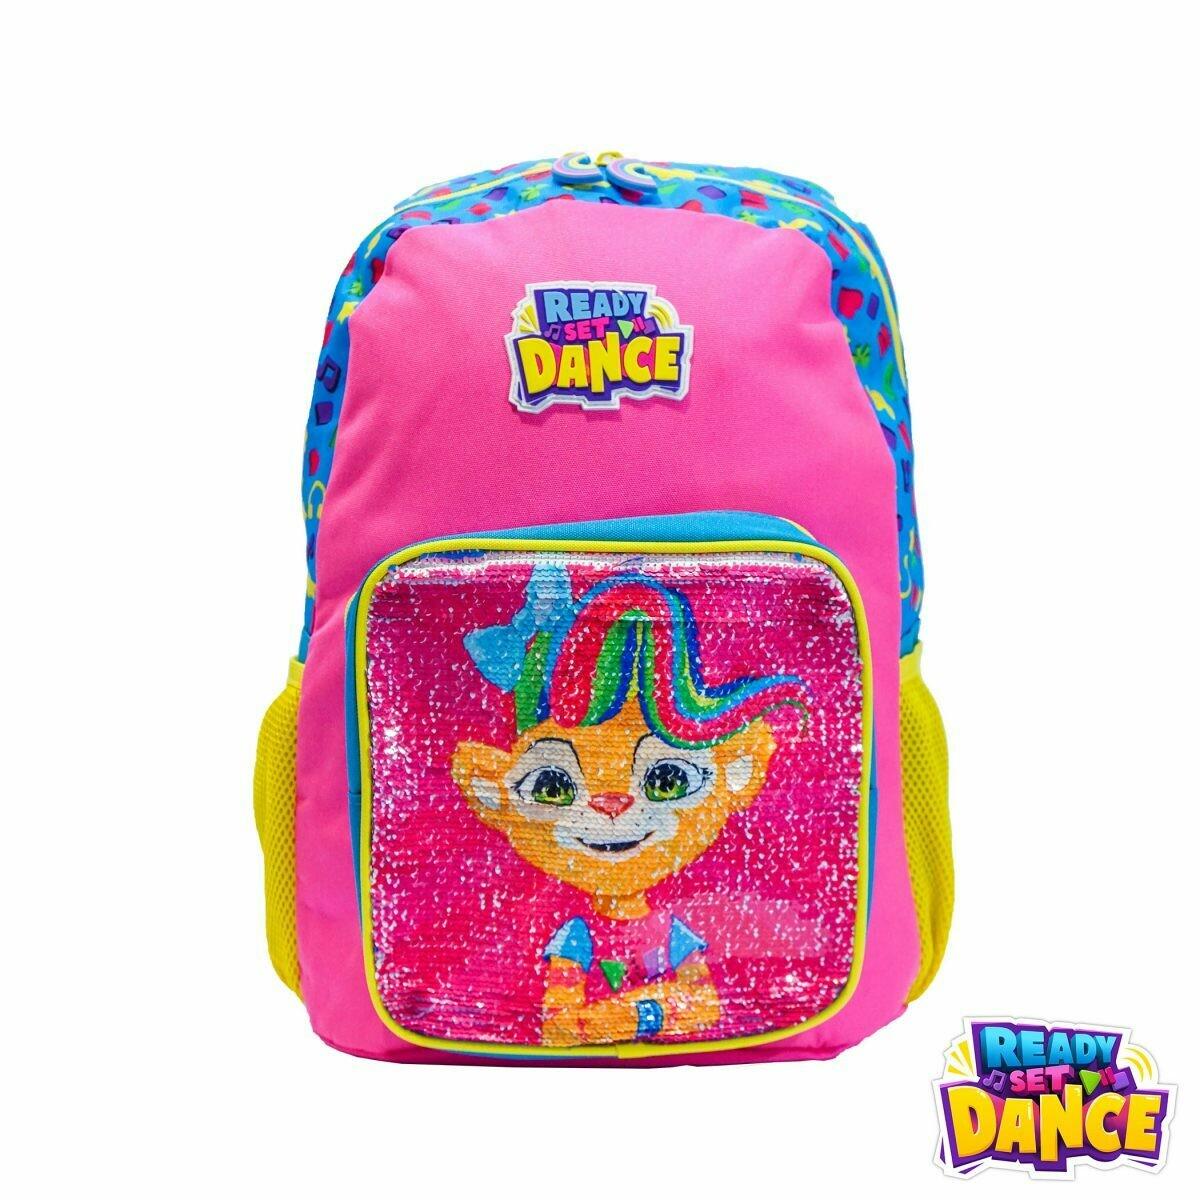 READ SET DANCE - Twirl Backpack